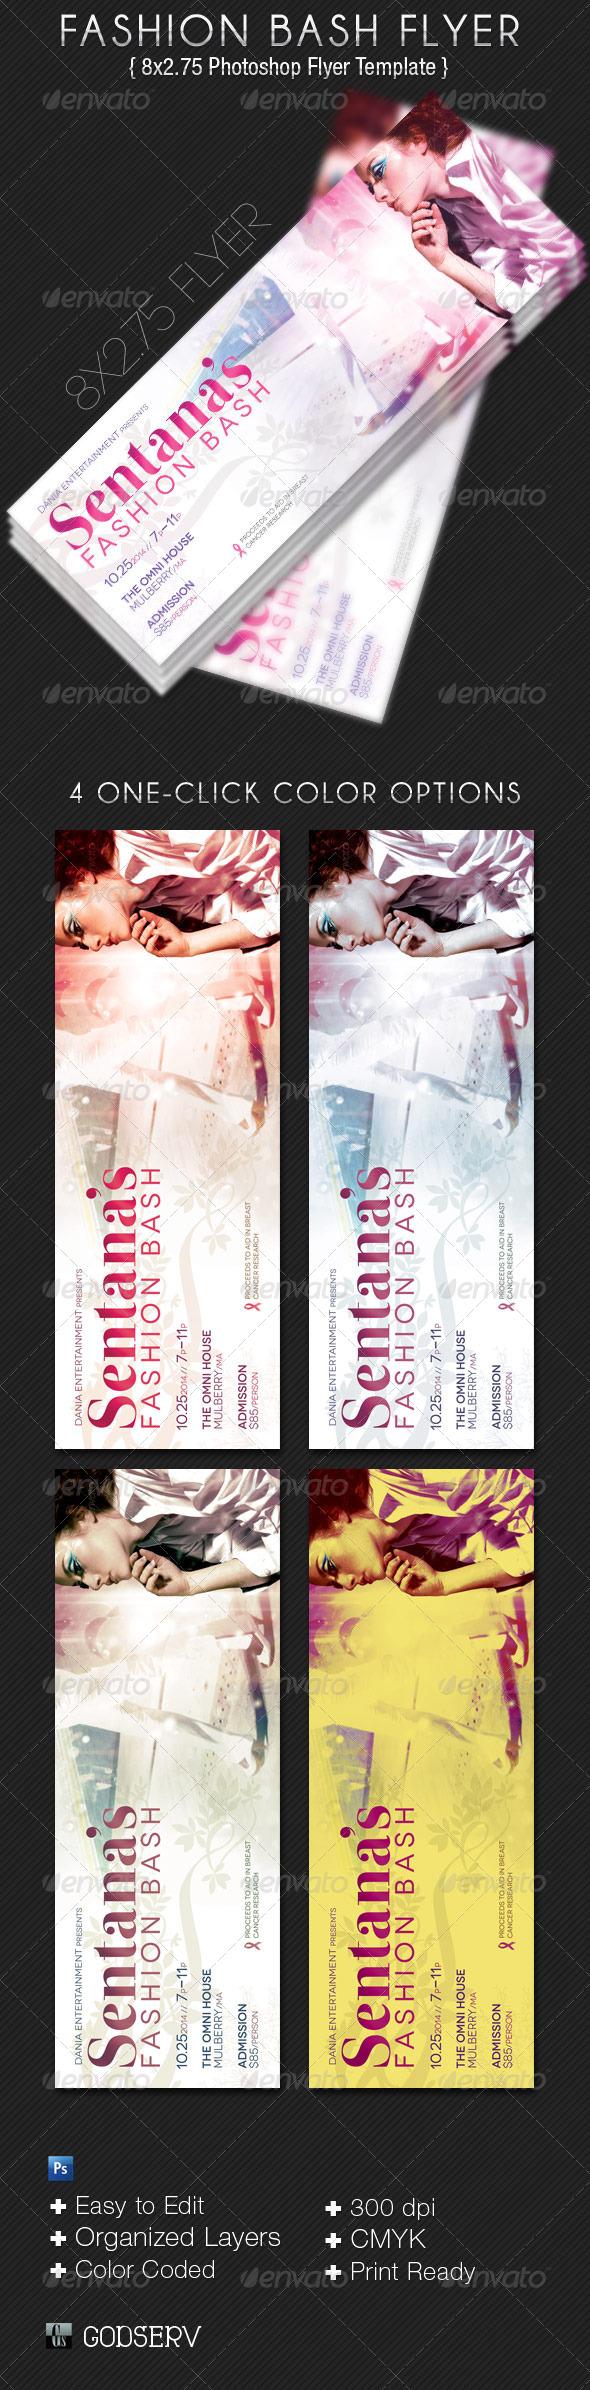 GraphicRiver Fashion Bash Flyer Template 4844753